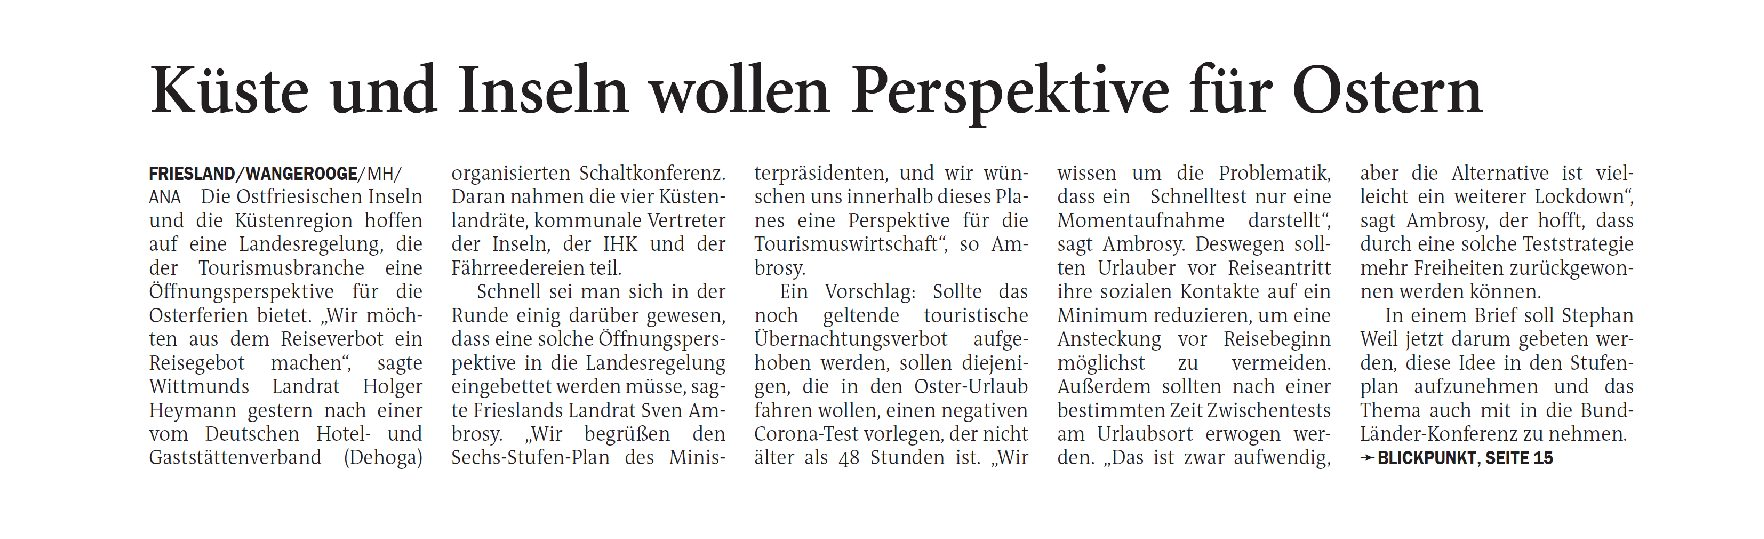 Jeversches Wochenblatt 24.02.2021 III